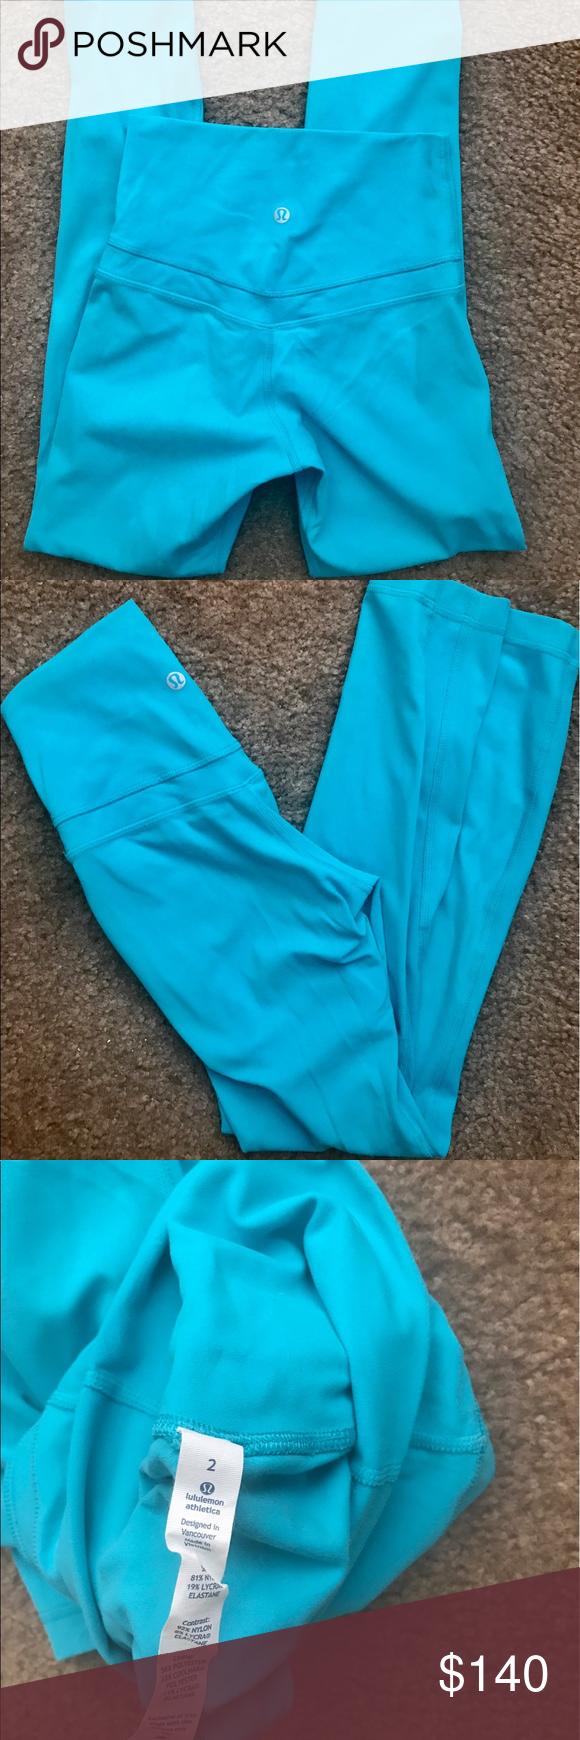 Lululemon original align pants. Sz 2. EUC Lululemon original align pants. Sz 2. EUC lululemon athletica Pants Leggings